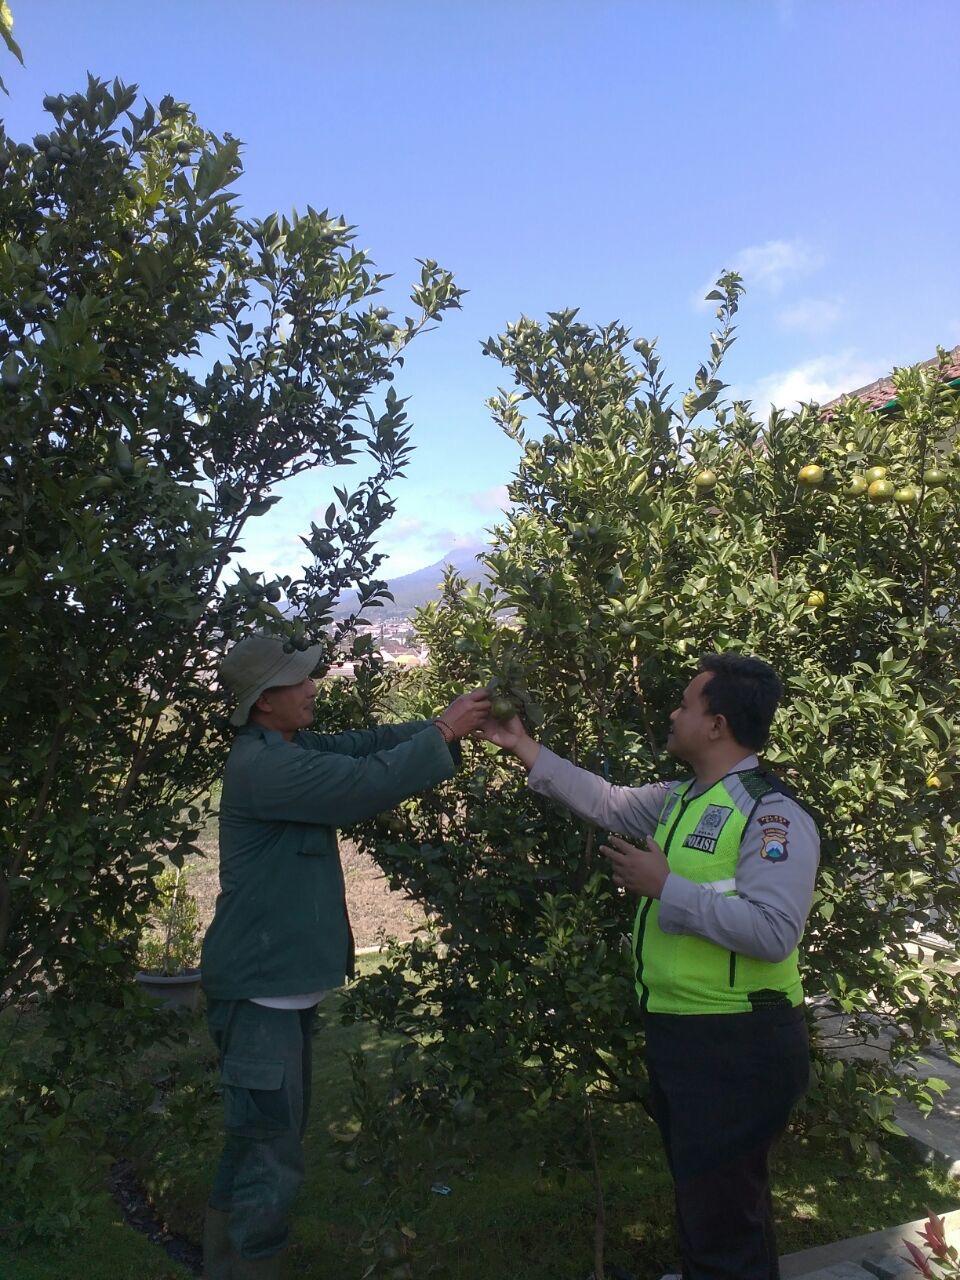 Anggota Polsek Batu Kota Polres Batu Melaksanakan Giat Sambang Perani Jeruk